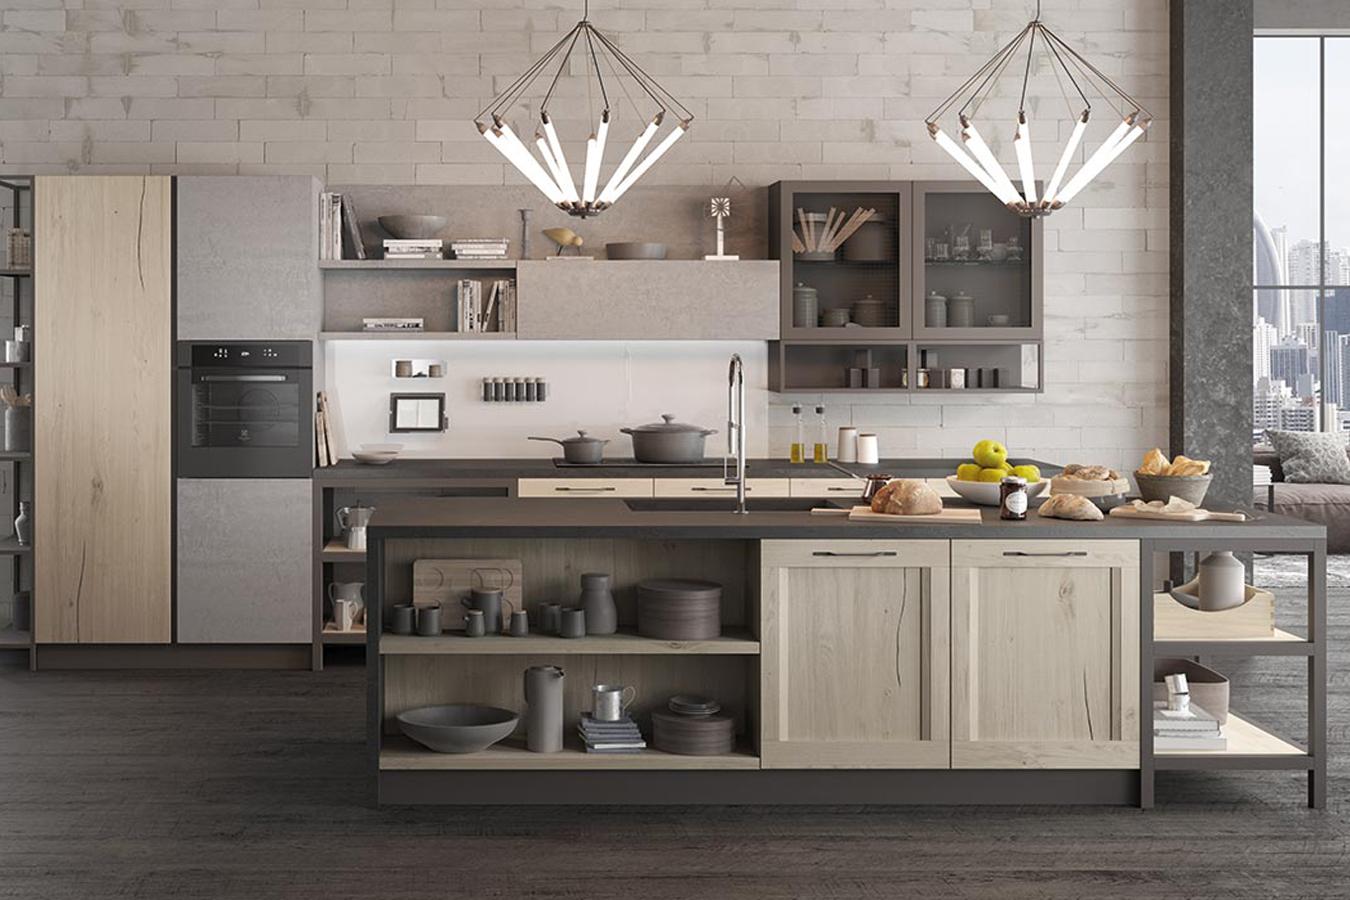 Cucina asia factory di arredo3 righetti mobili novara for Visma arredo 3